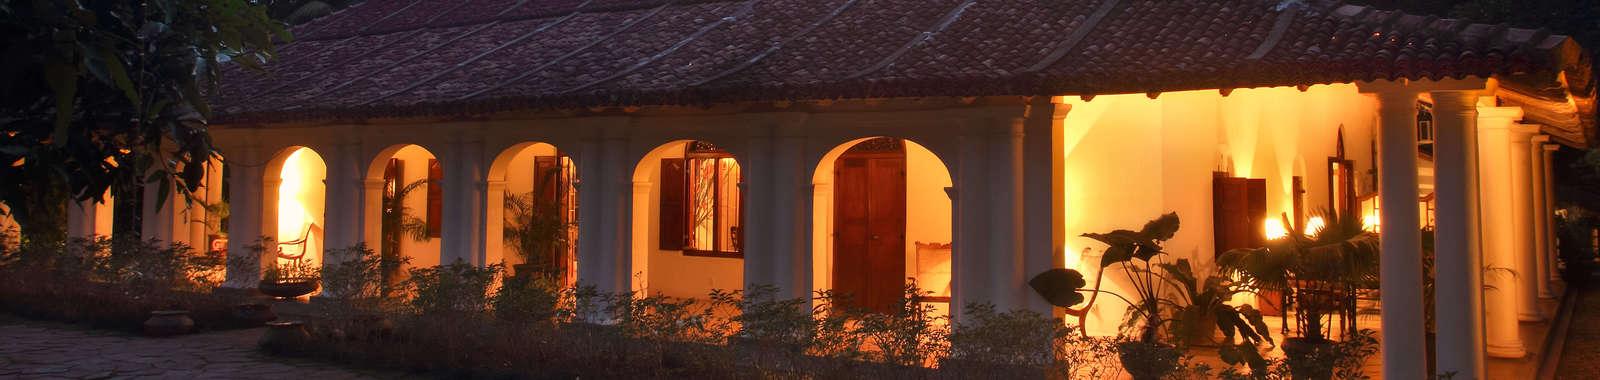 10TheKandyHouse,Kandy,SriLanka